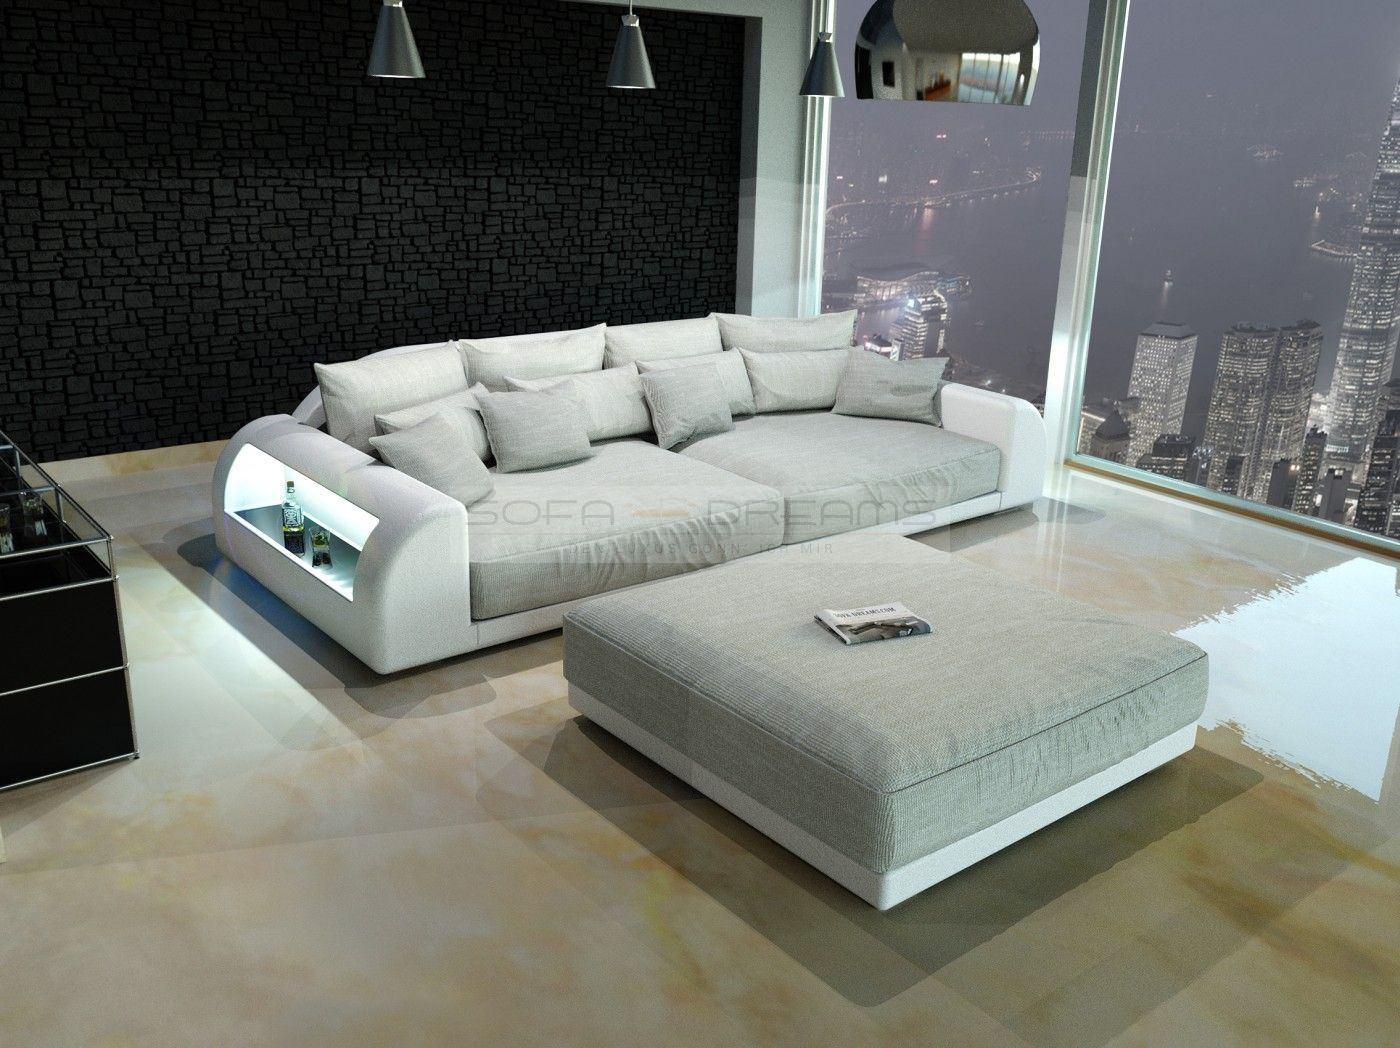 mega sofa caruso leather power motion sectional xxl big miami megasofa with illumination